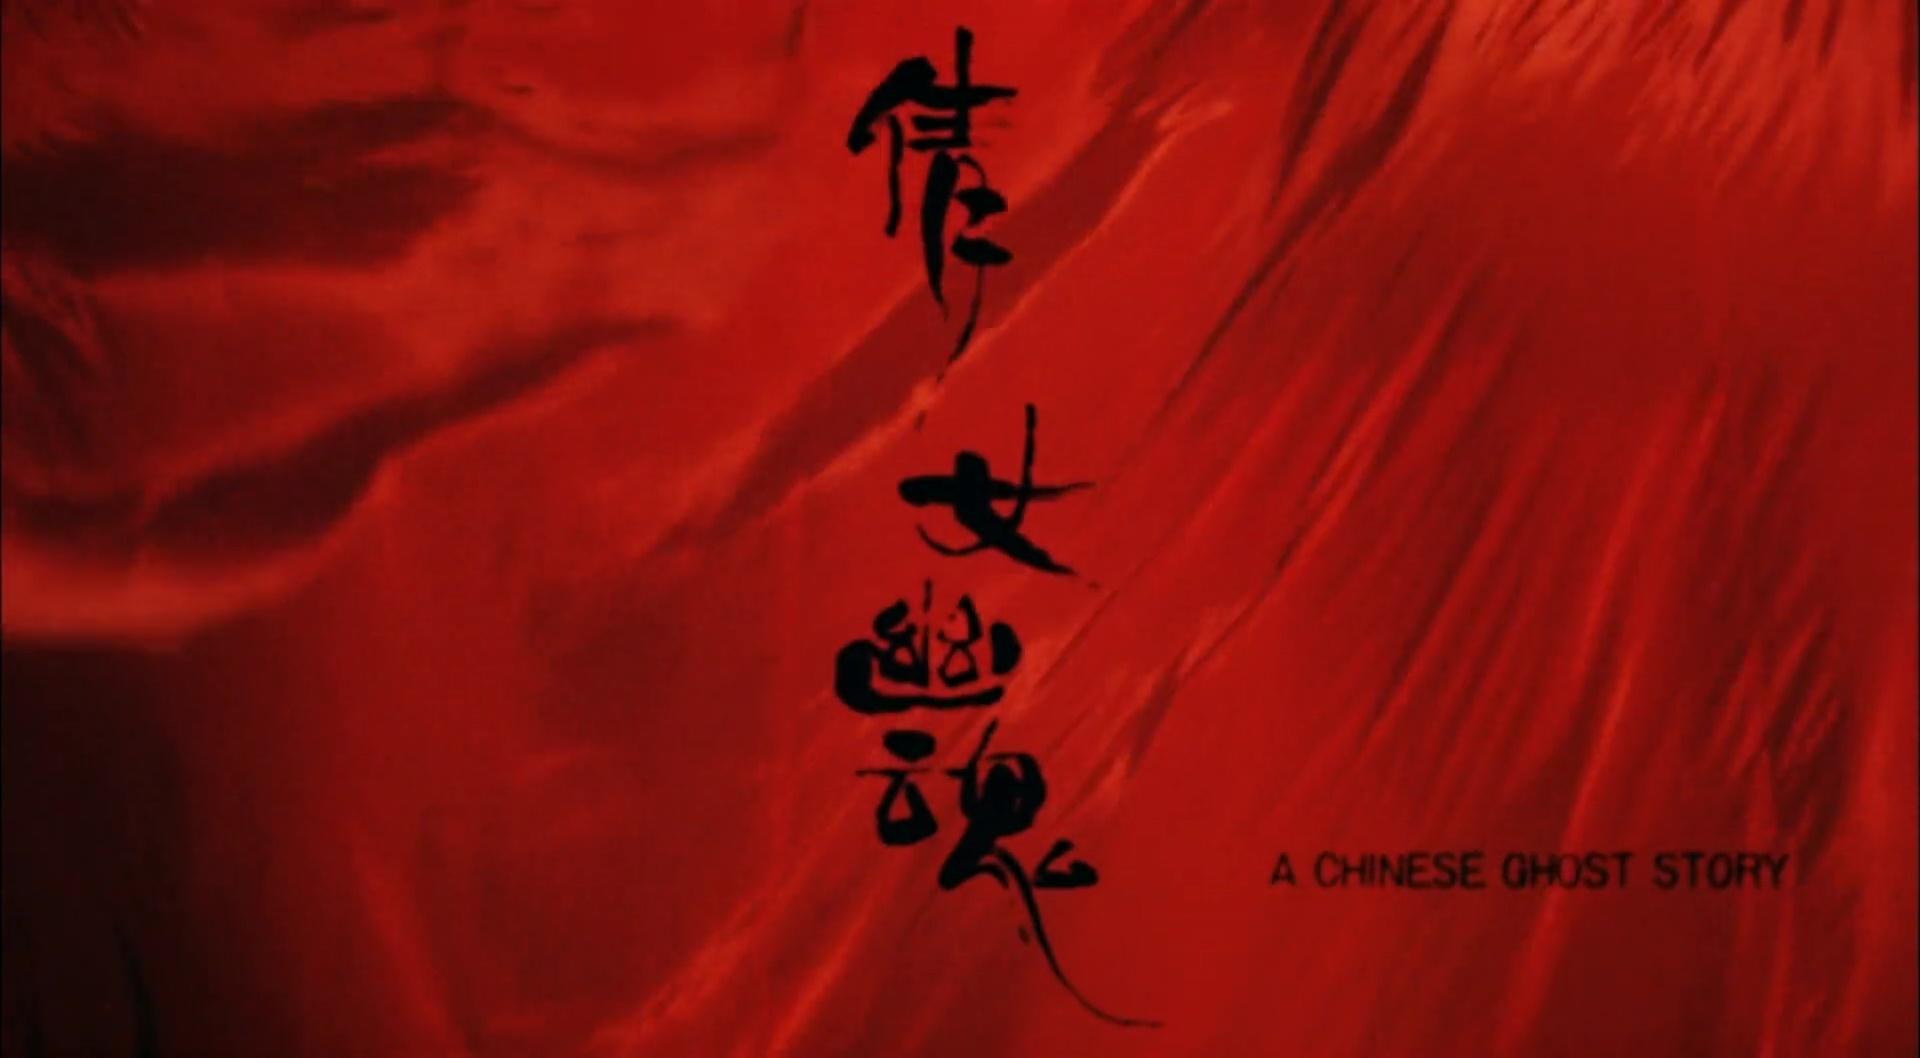 HISTOIRES DE FANTÔMES CHINOIS (倩女幽魂) de Ching Siu Tung (1987)